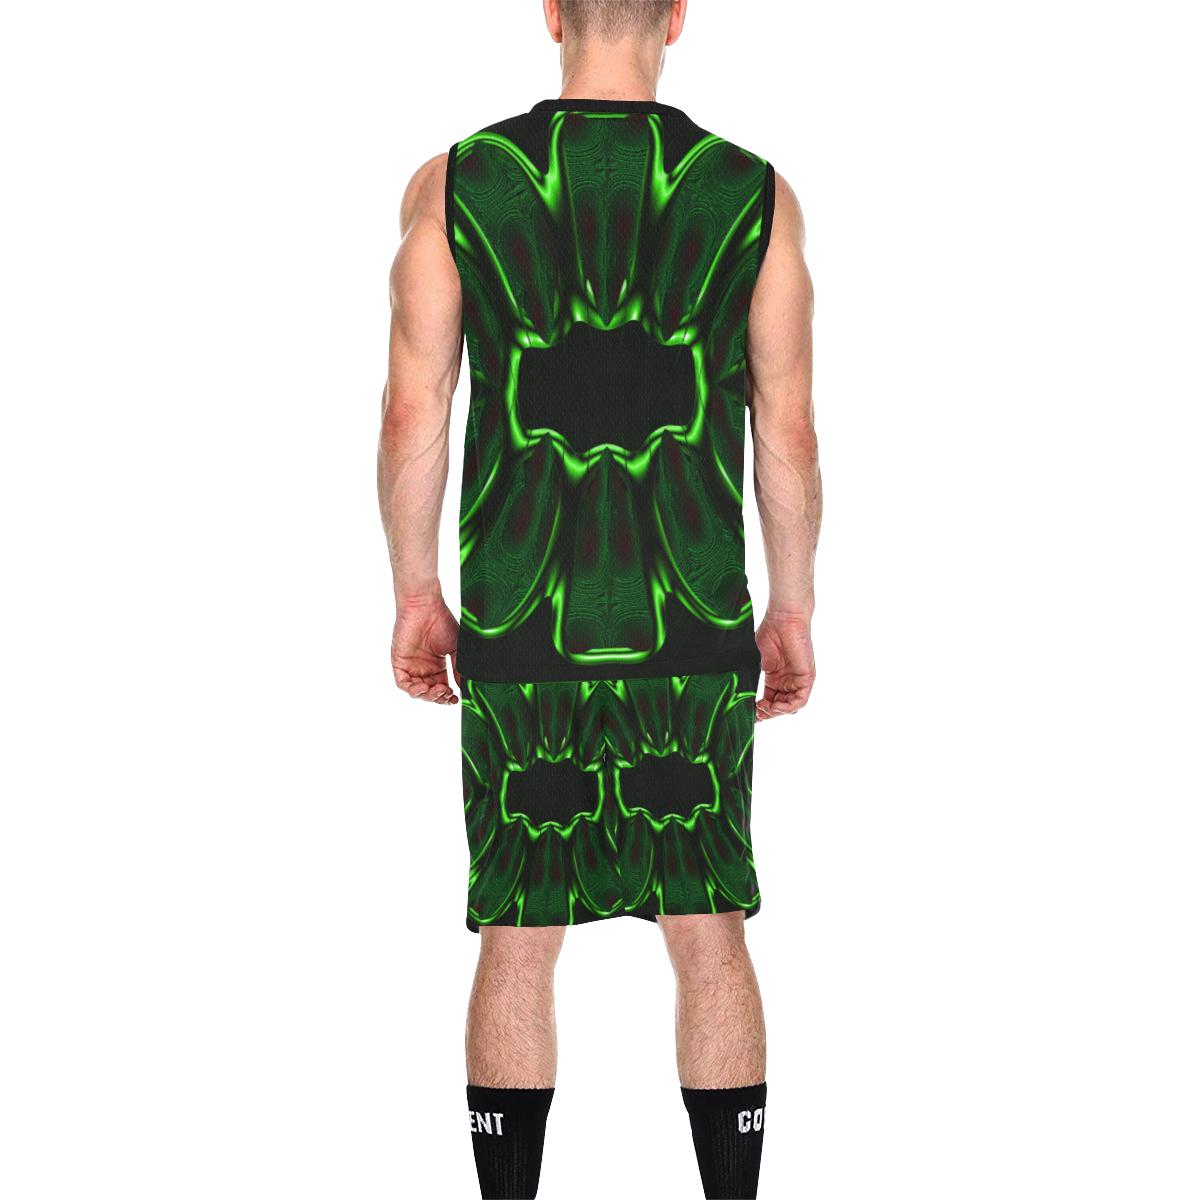 8000  EKPAH 7 low All Over Print Basketball Uniform